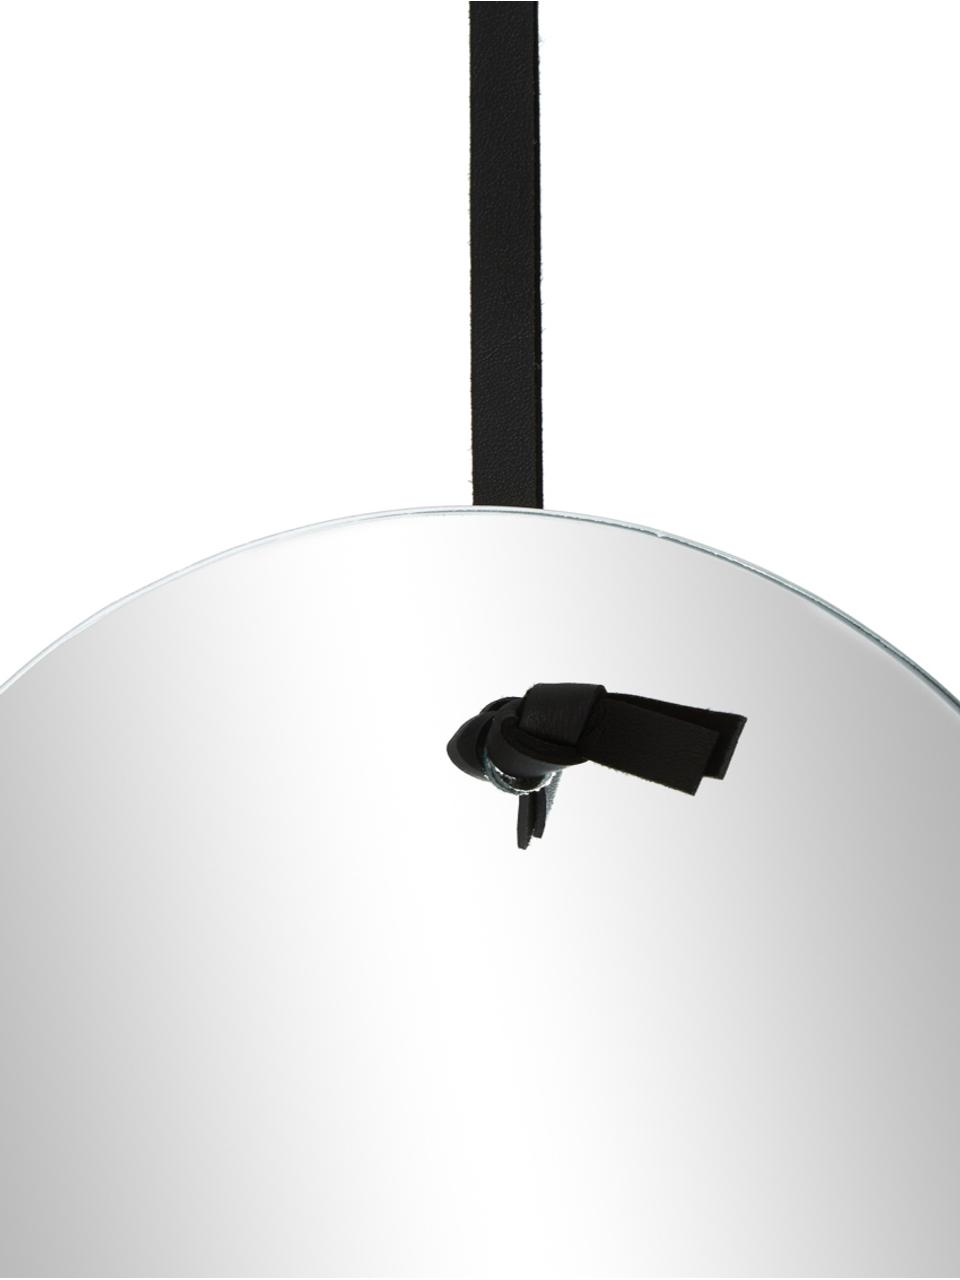 Ovale wandspiegel Terry met zwarte ophanging, Spiegelglas, zwart, 24 x 38 cm